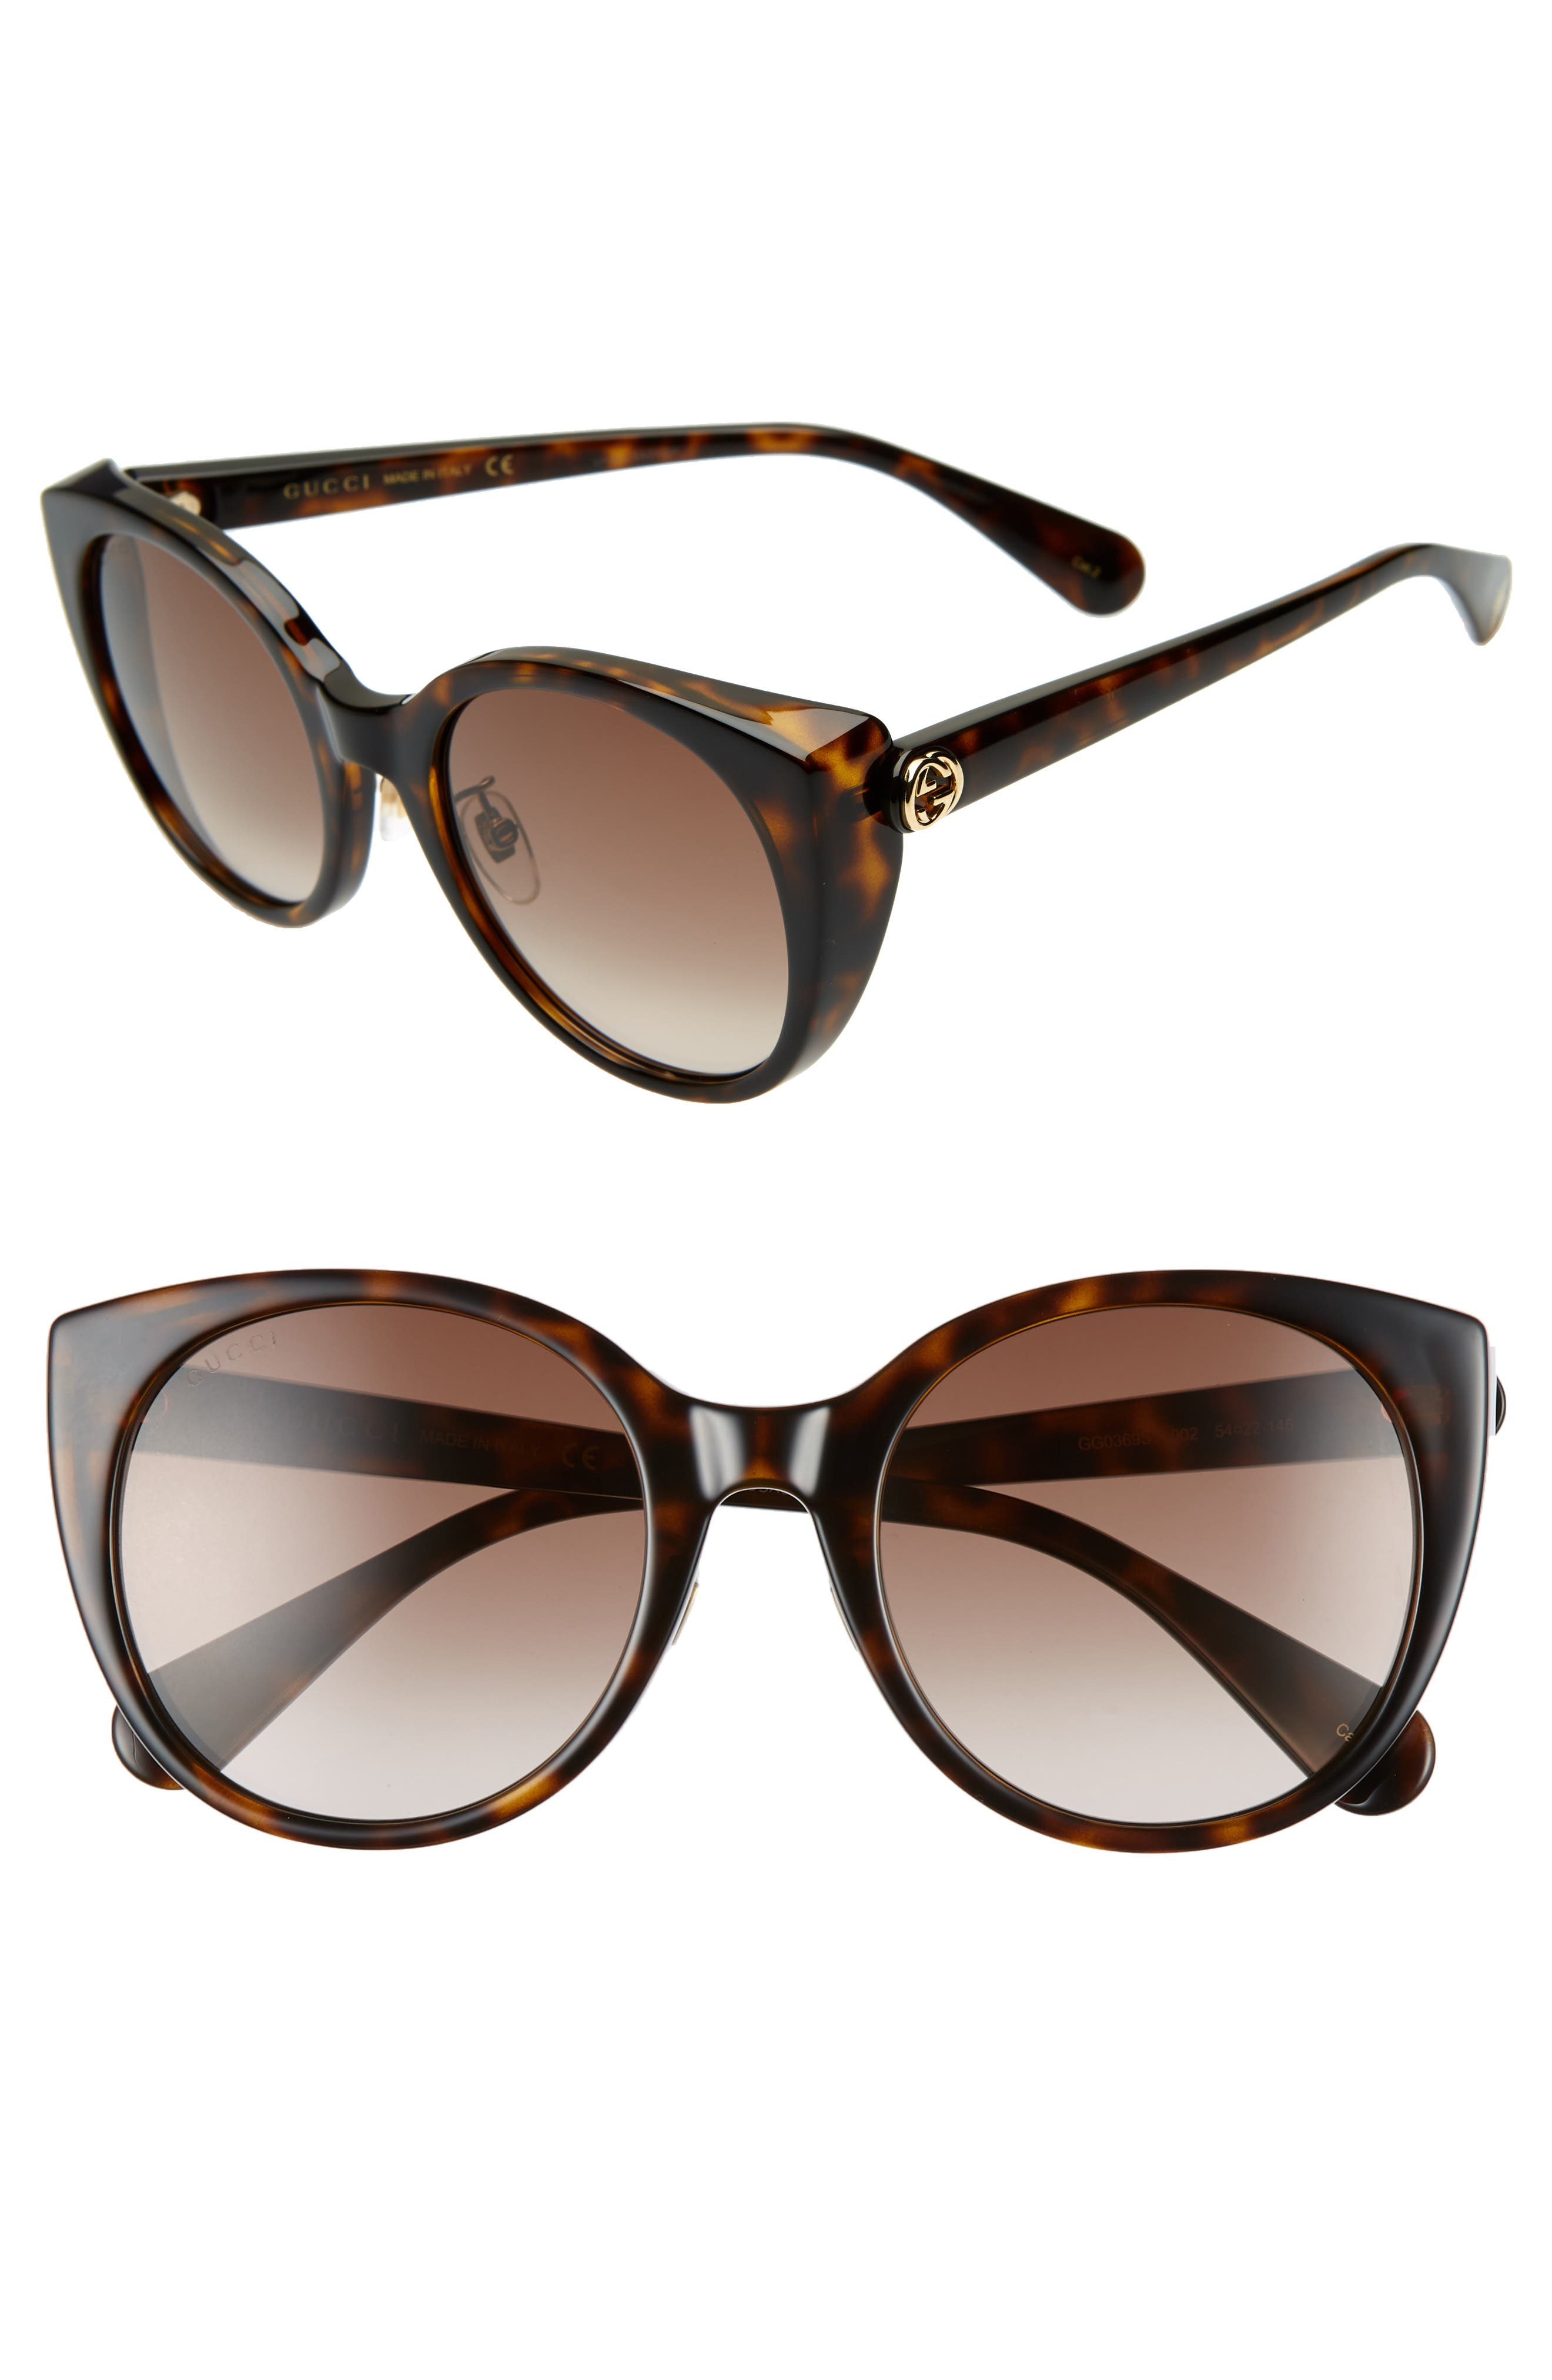 6f0c2d5231 Gucci 5m Cat Eye Sunglasses - Dark Havana  Brown Gradient